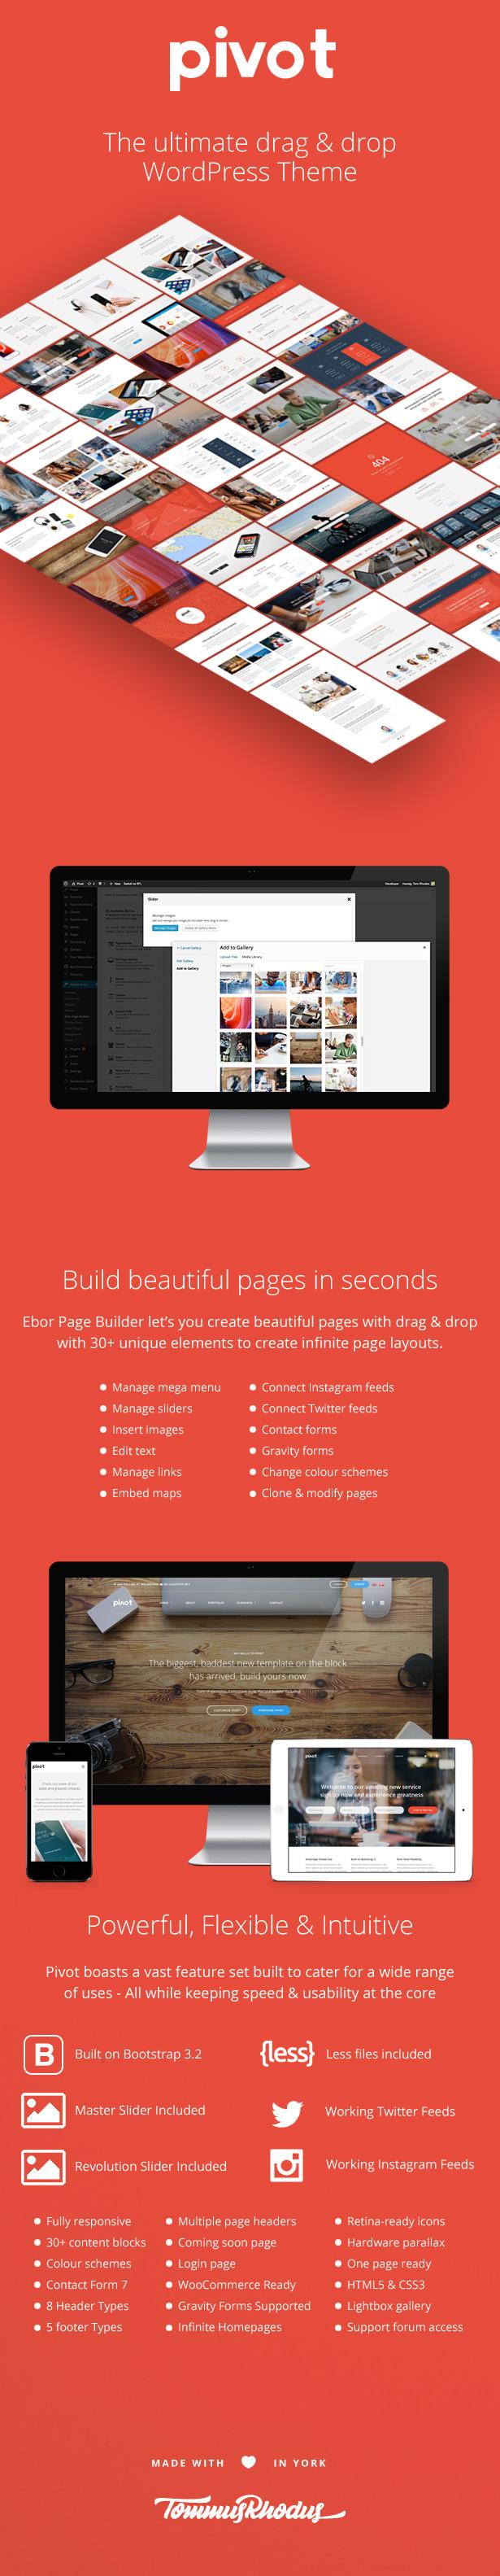 Pivot | Responsive Multipurpose WordPress Theme - 8